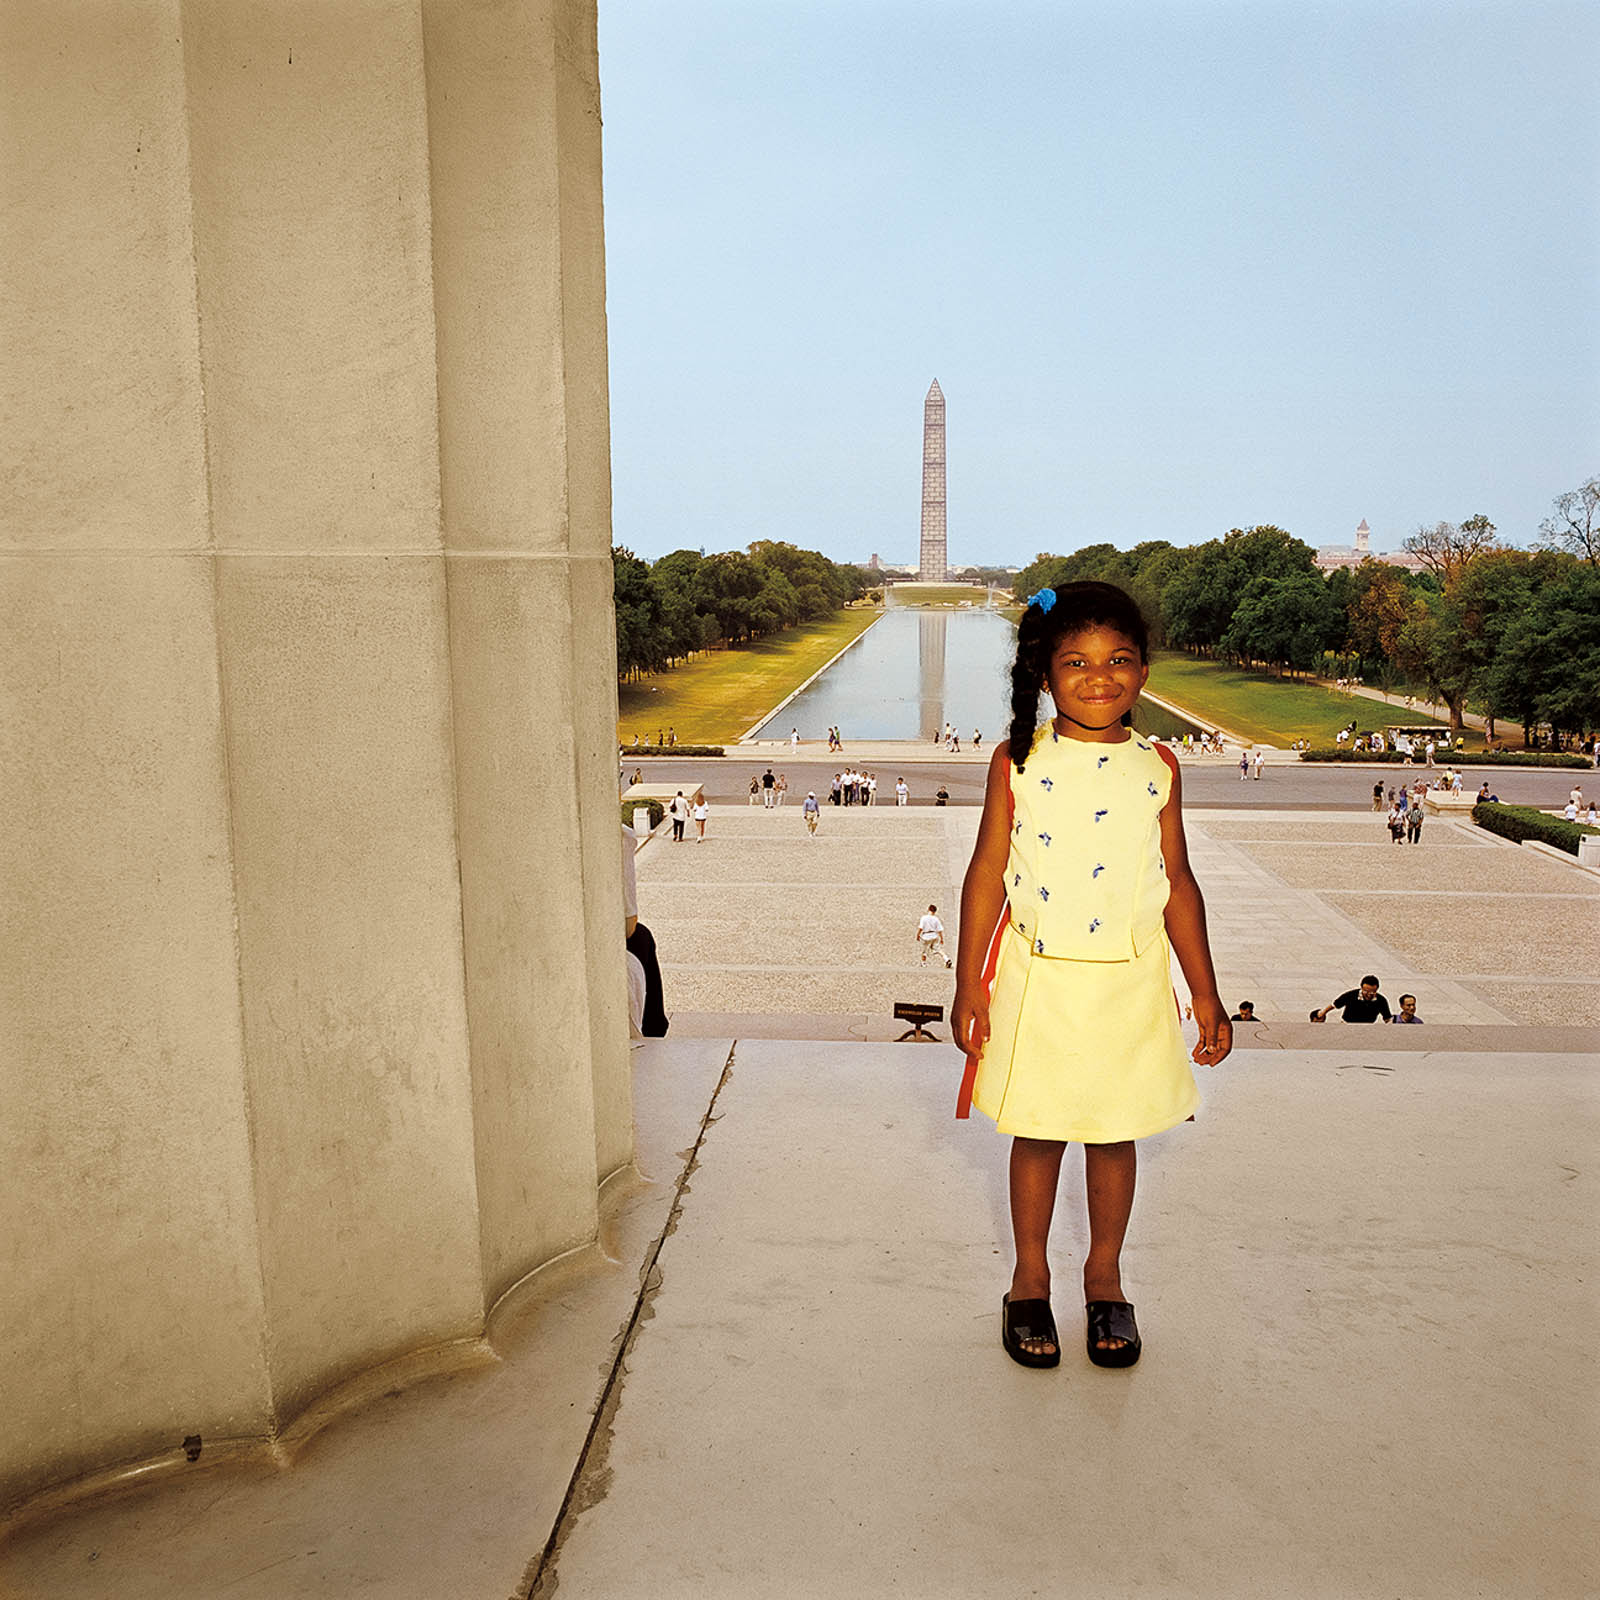 Young Girl at Lincoln Memorial, Washington, DC 1999